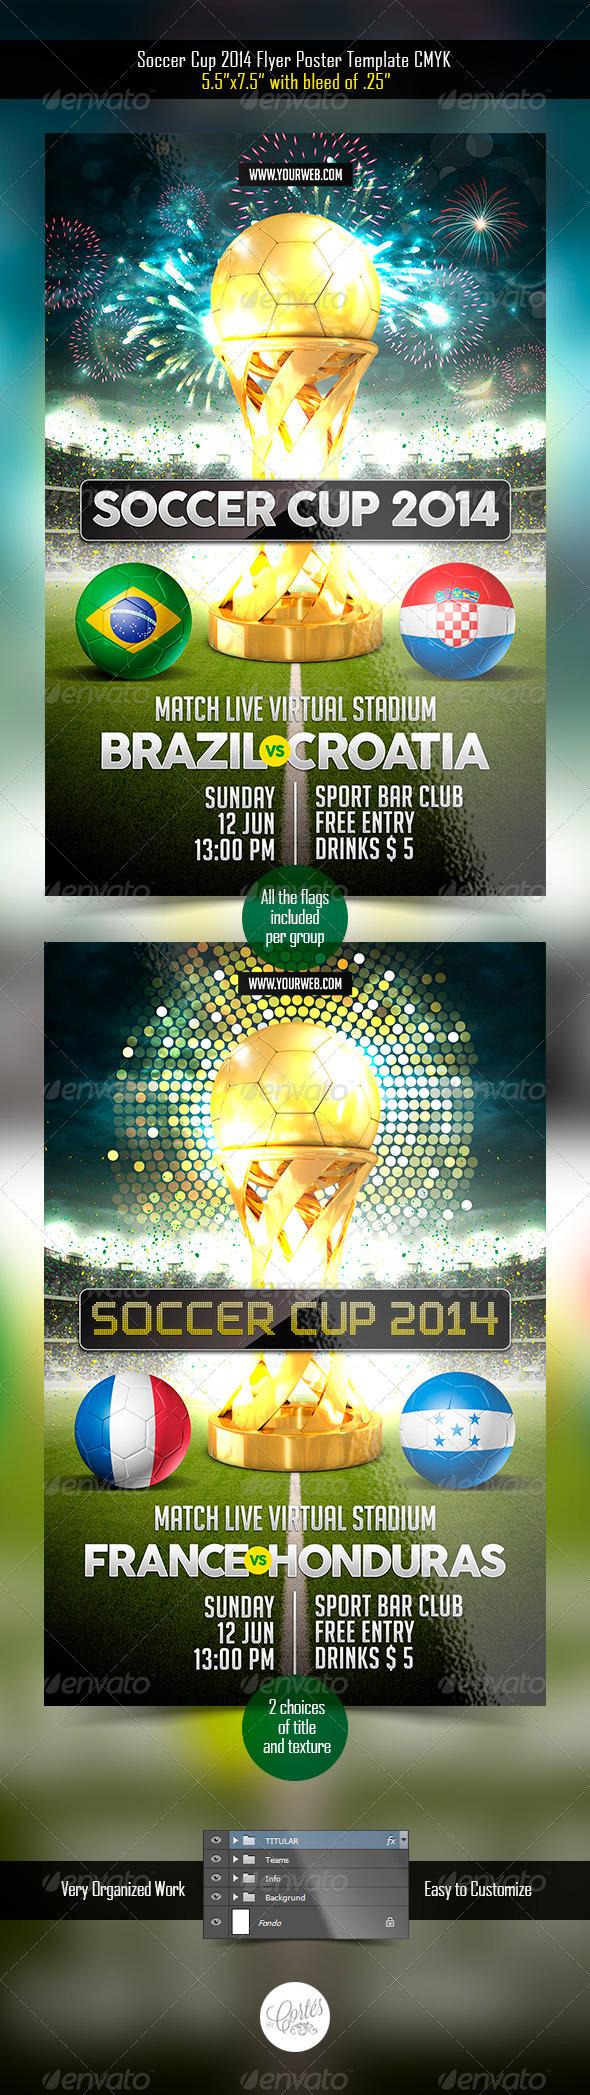 FIFA-World-Cup-in-Brasil-5